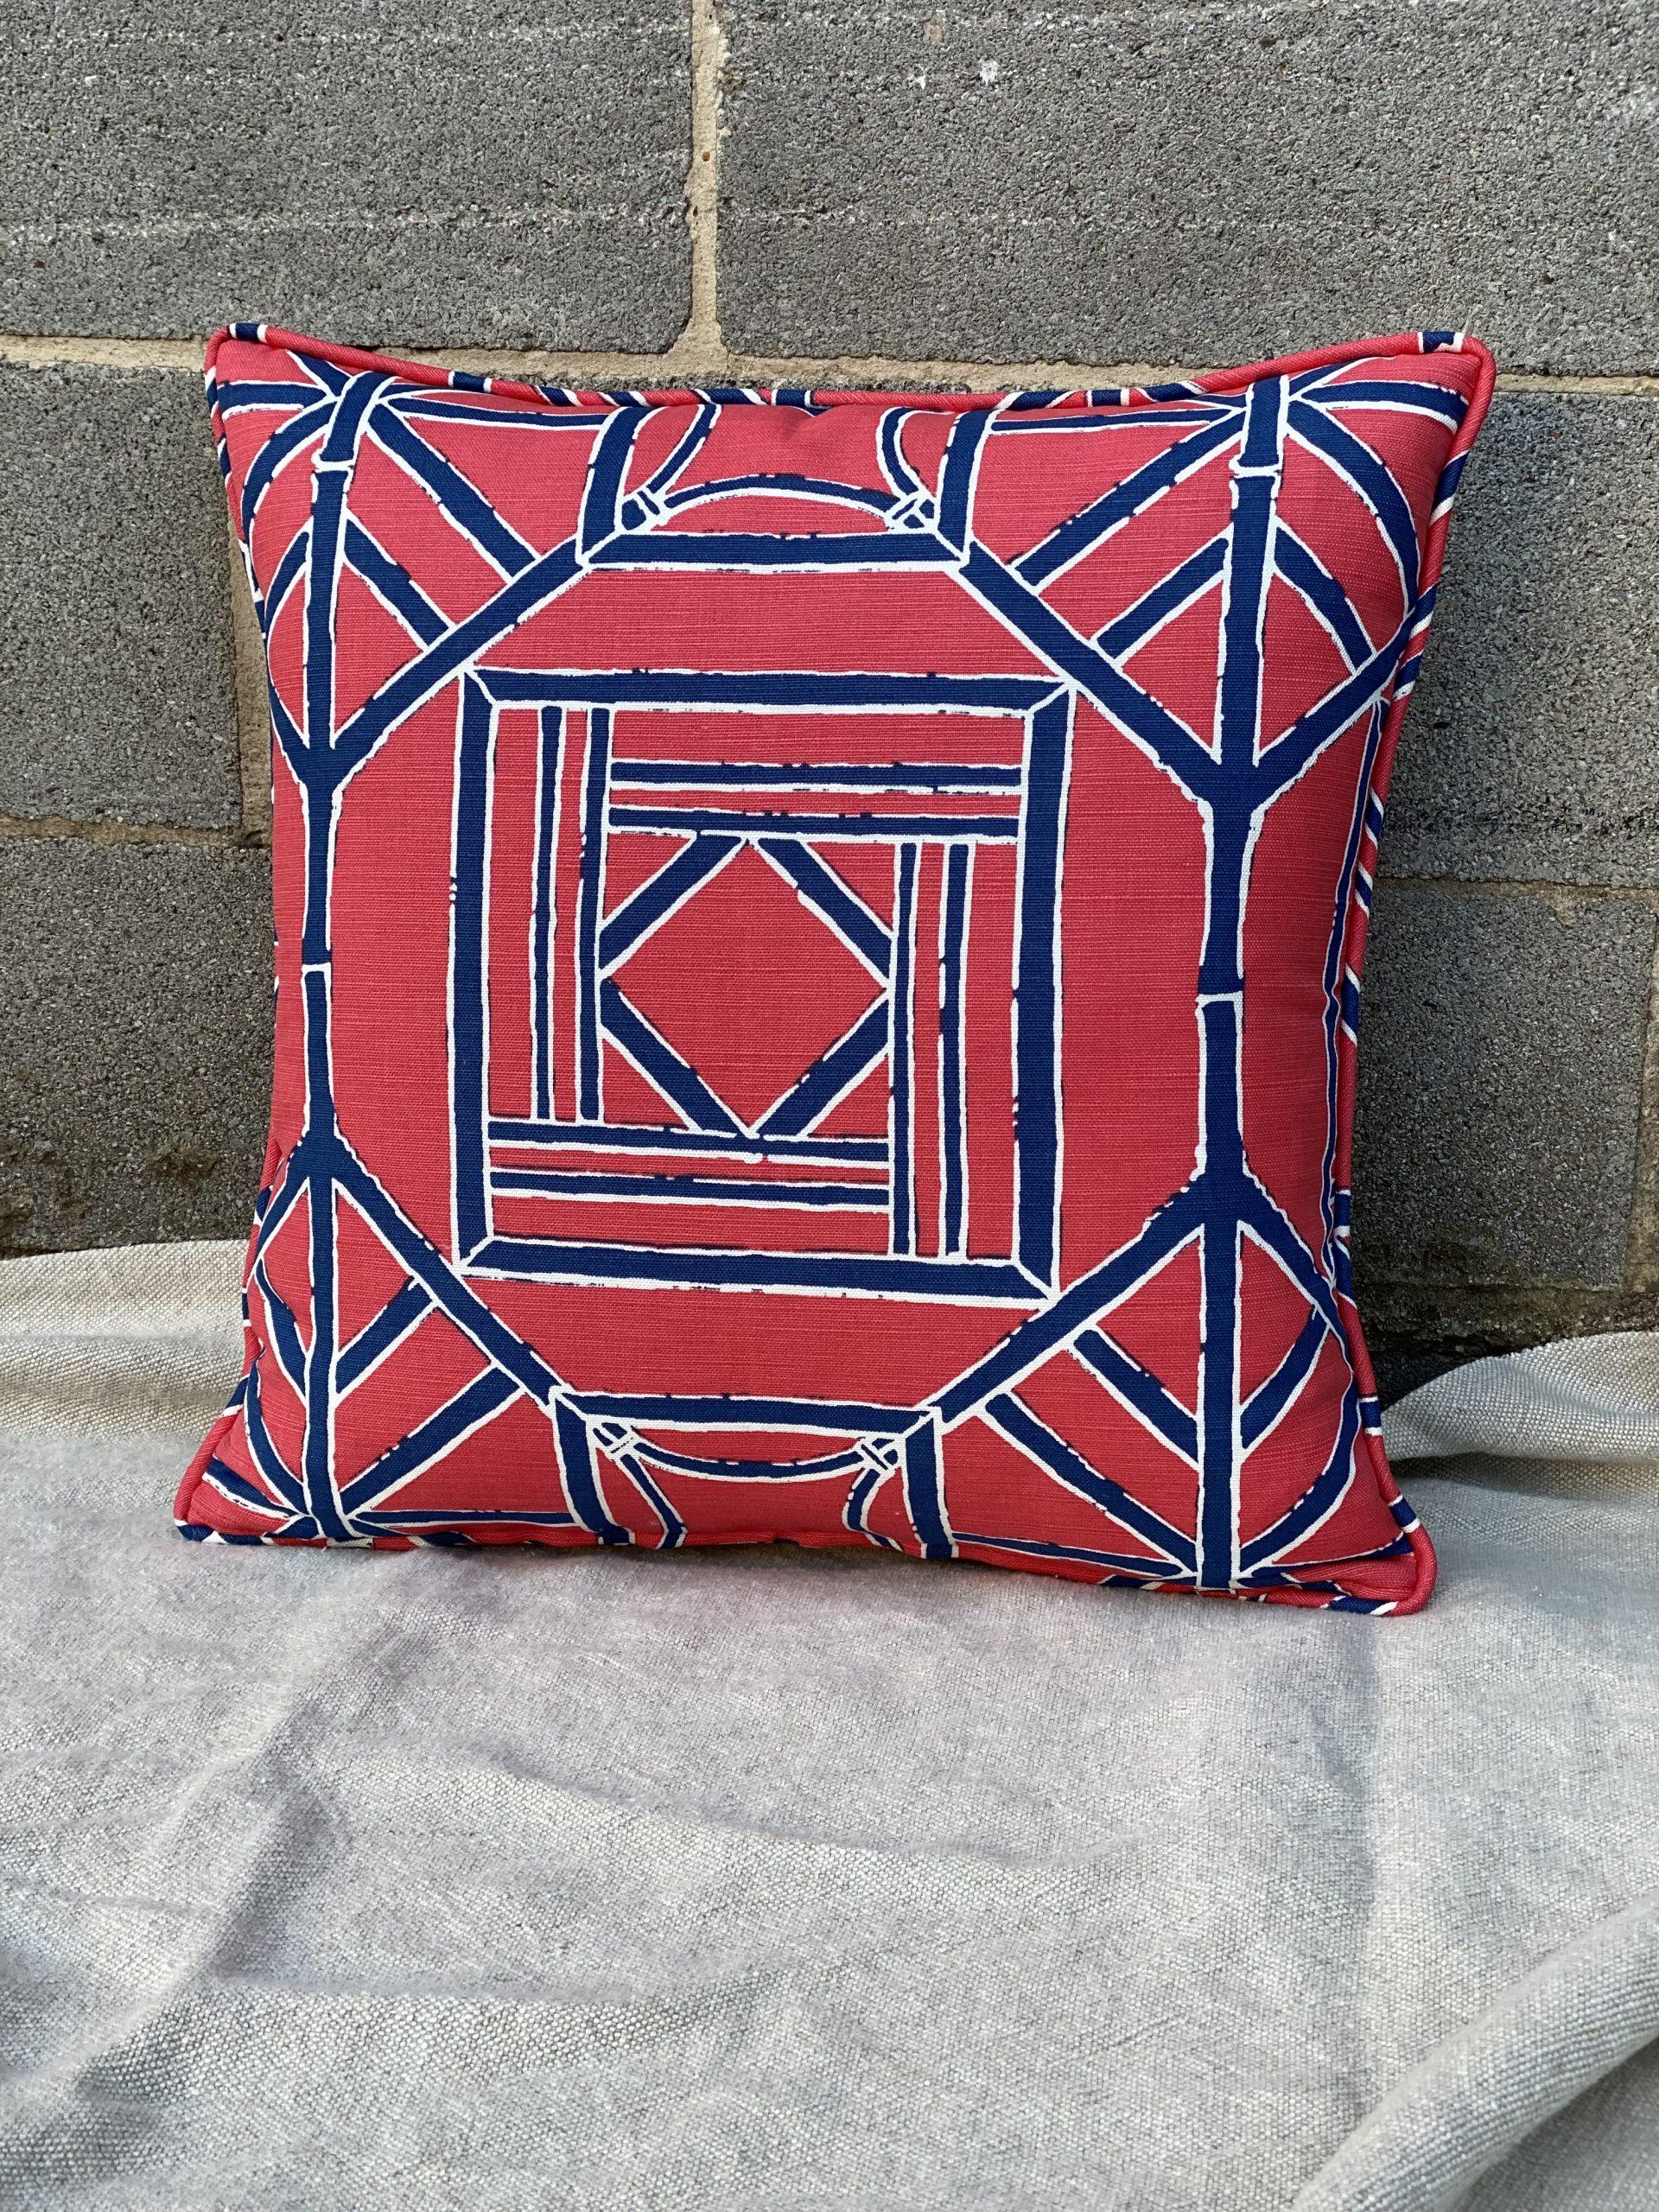 Renu Mathias Interiors Pillows